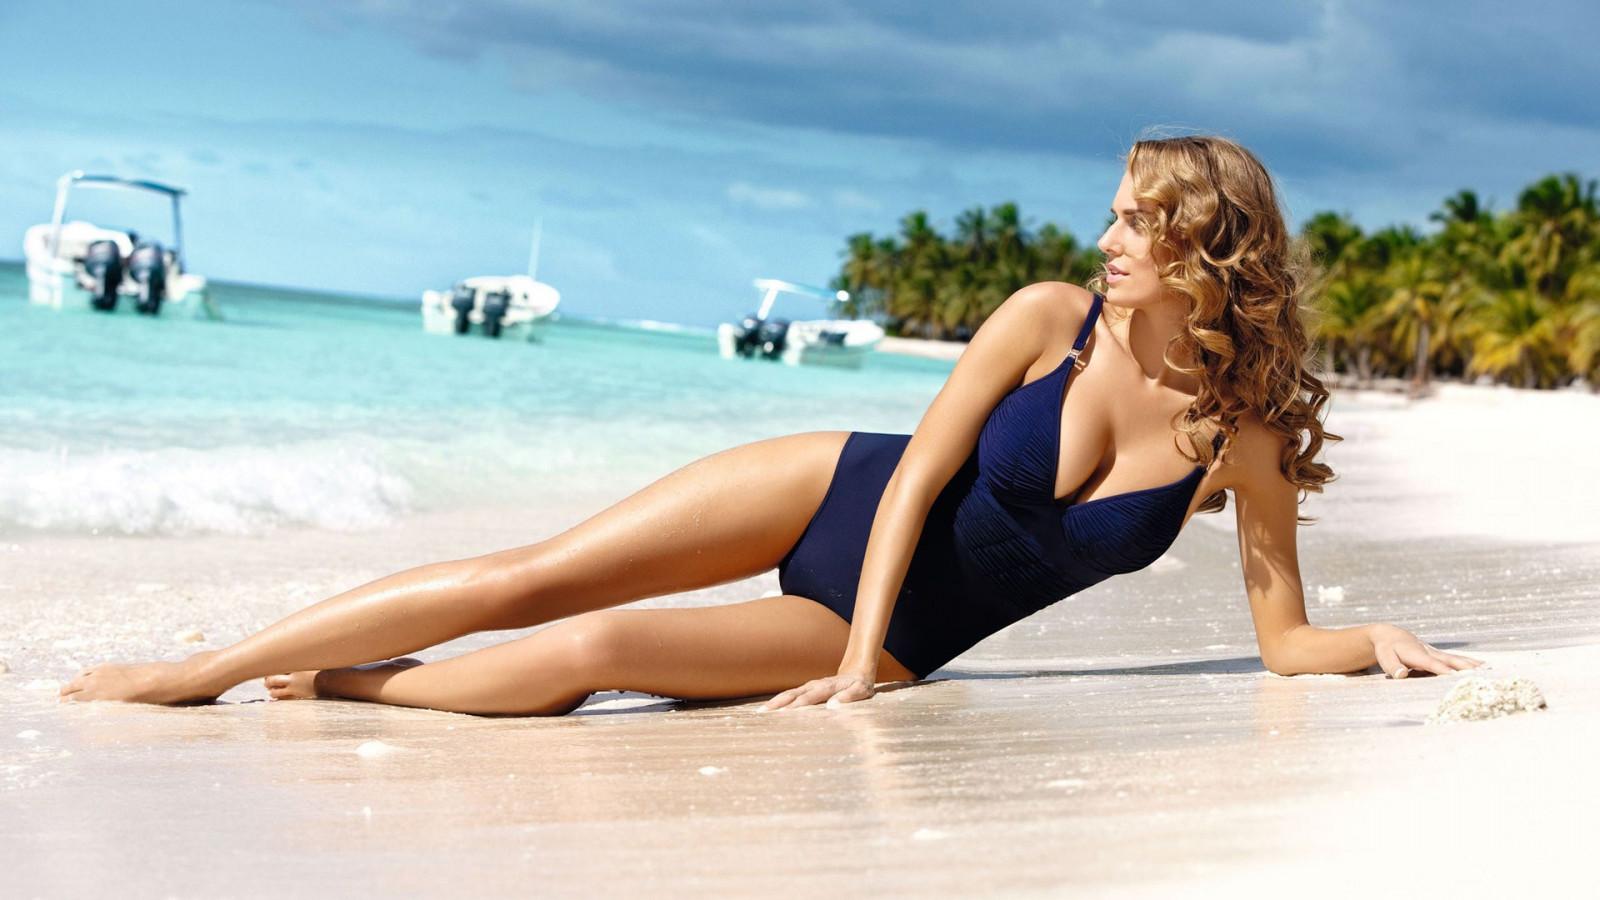 море пляж фото девушки кончивший вова